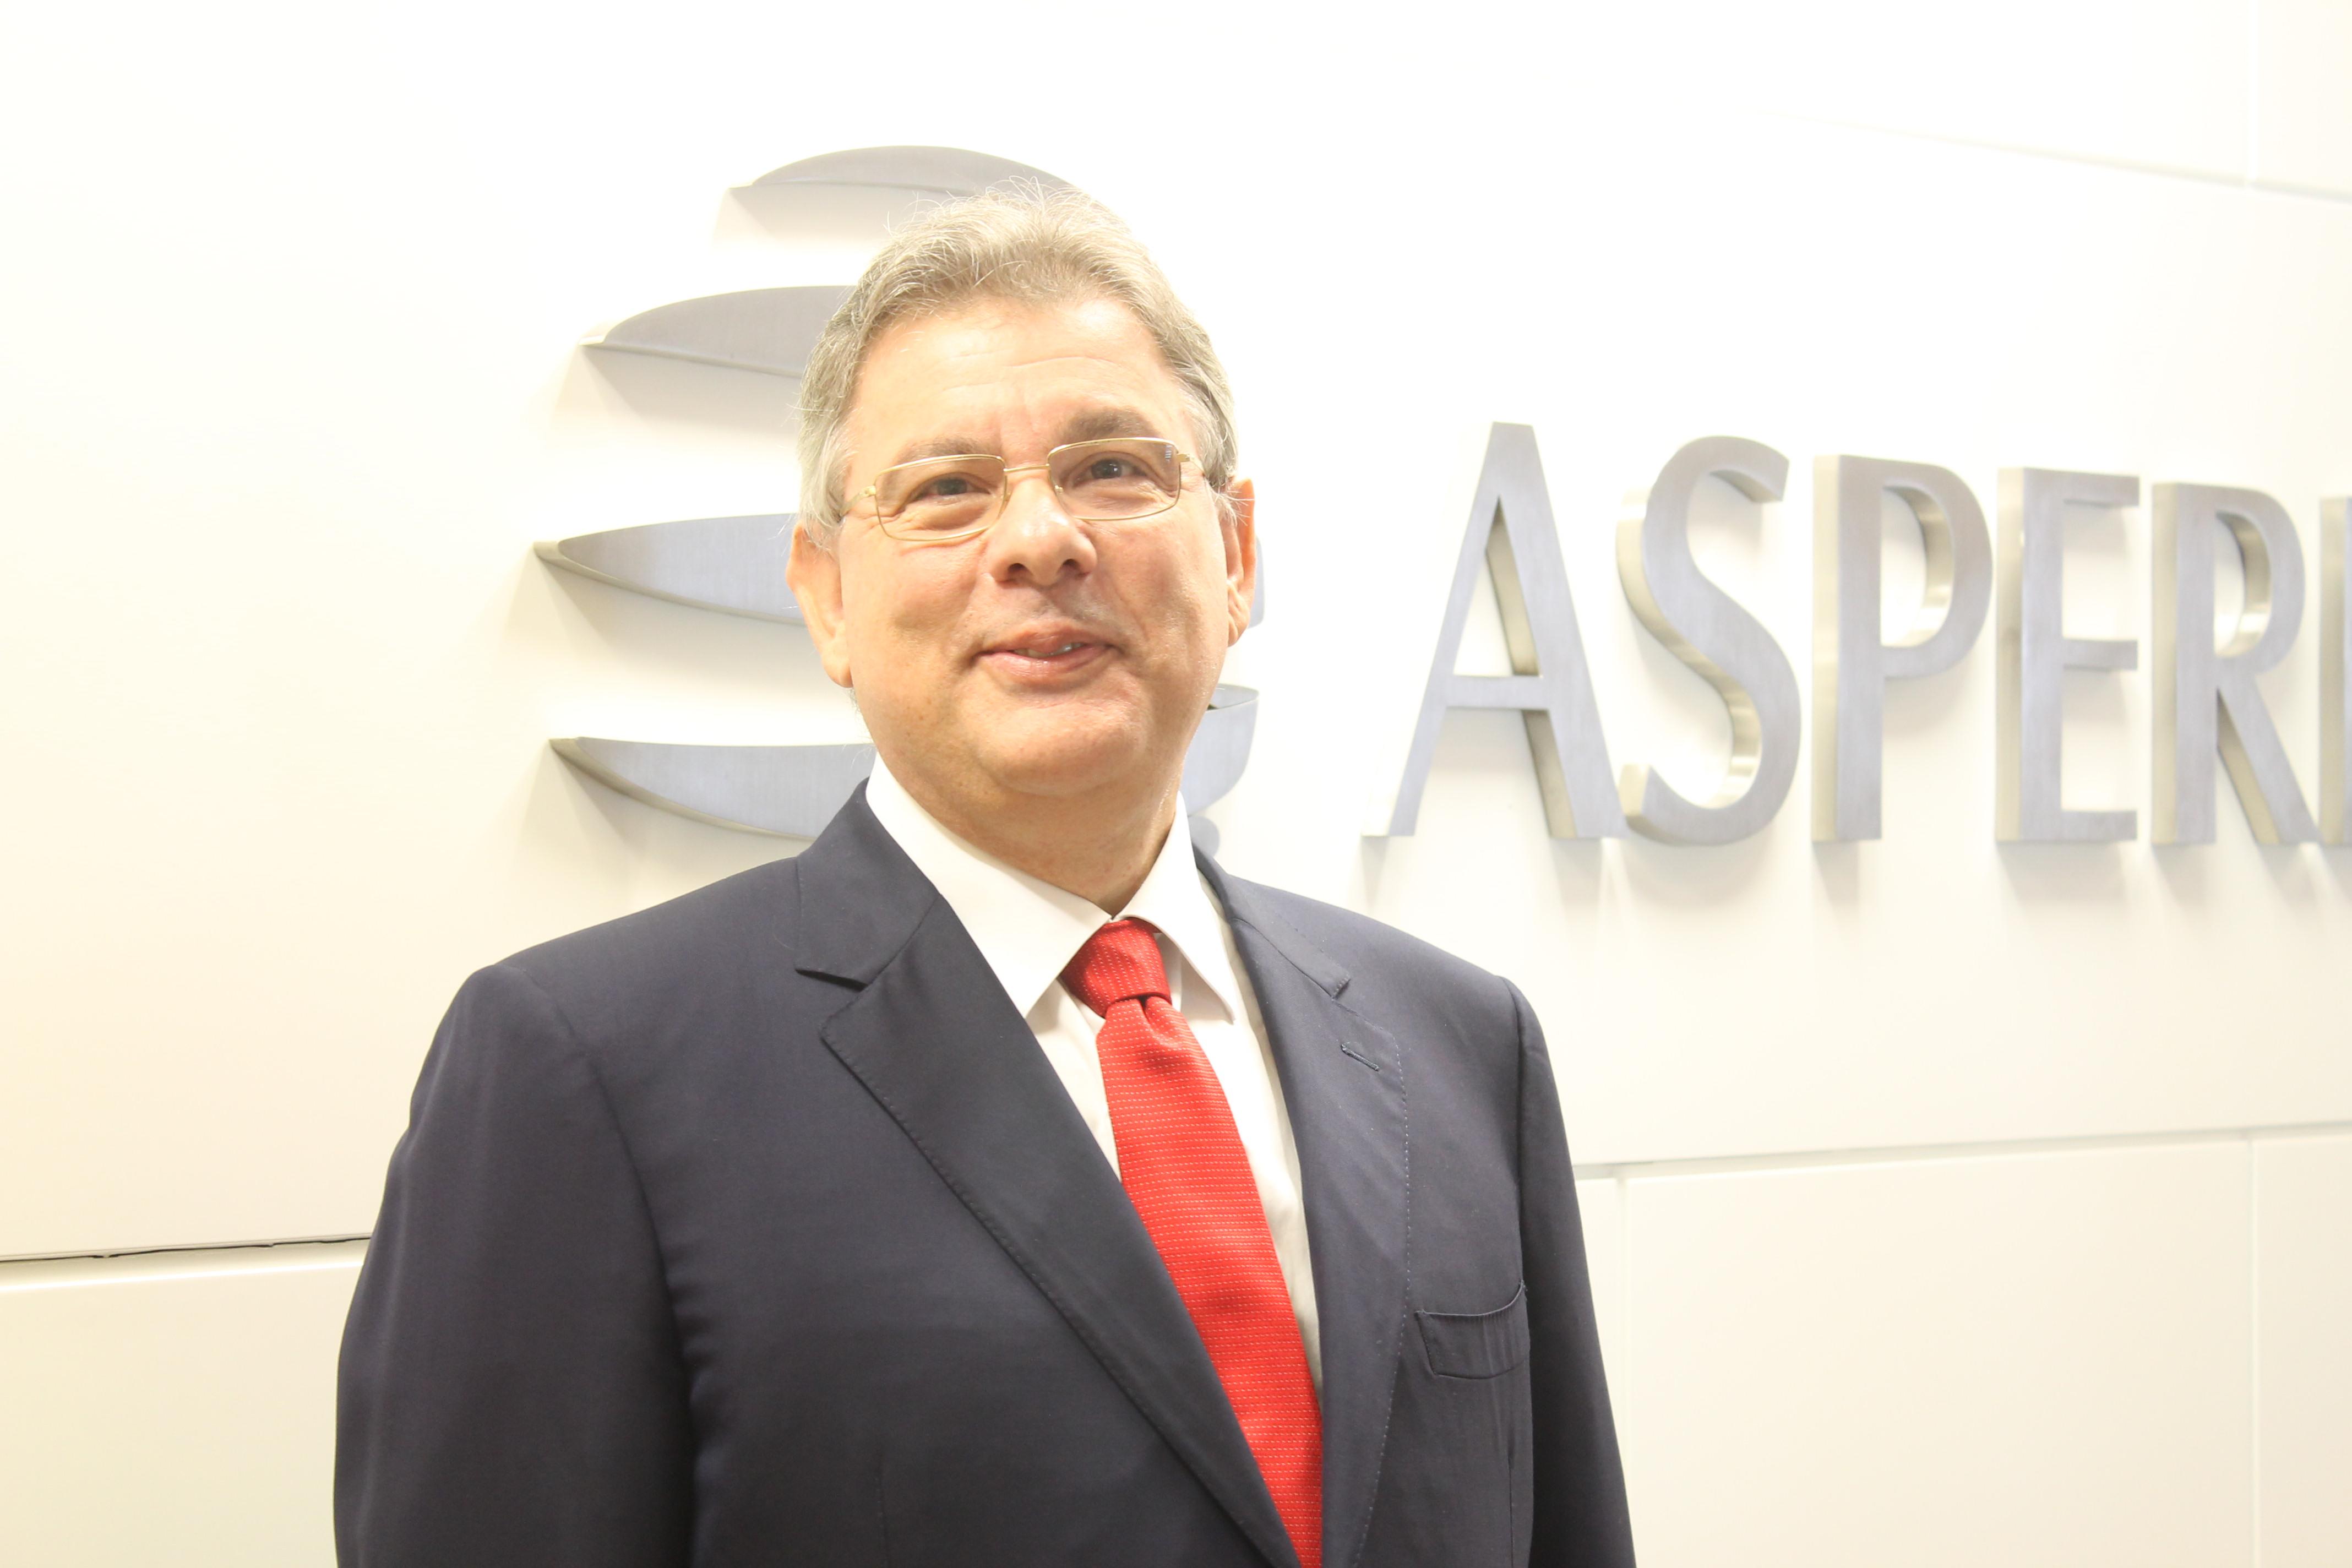 José Roberto Colnaghi, da Aspebras, apresenta produtos inovadores na Agrishow 2018